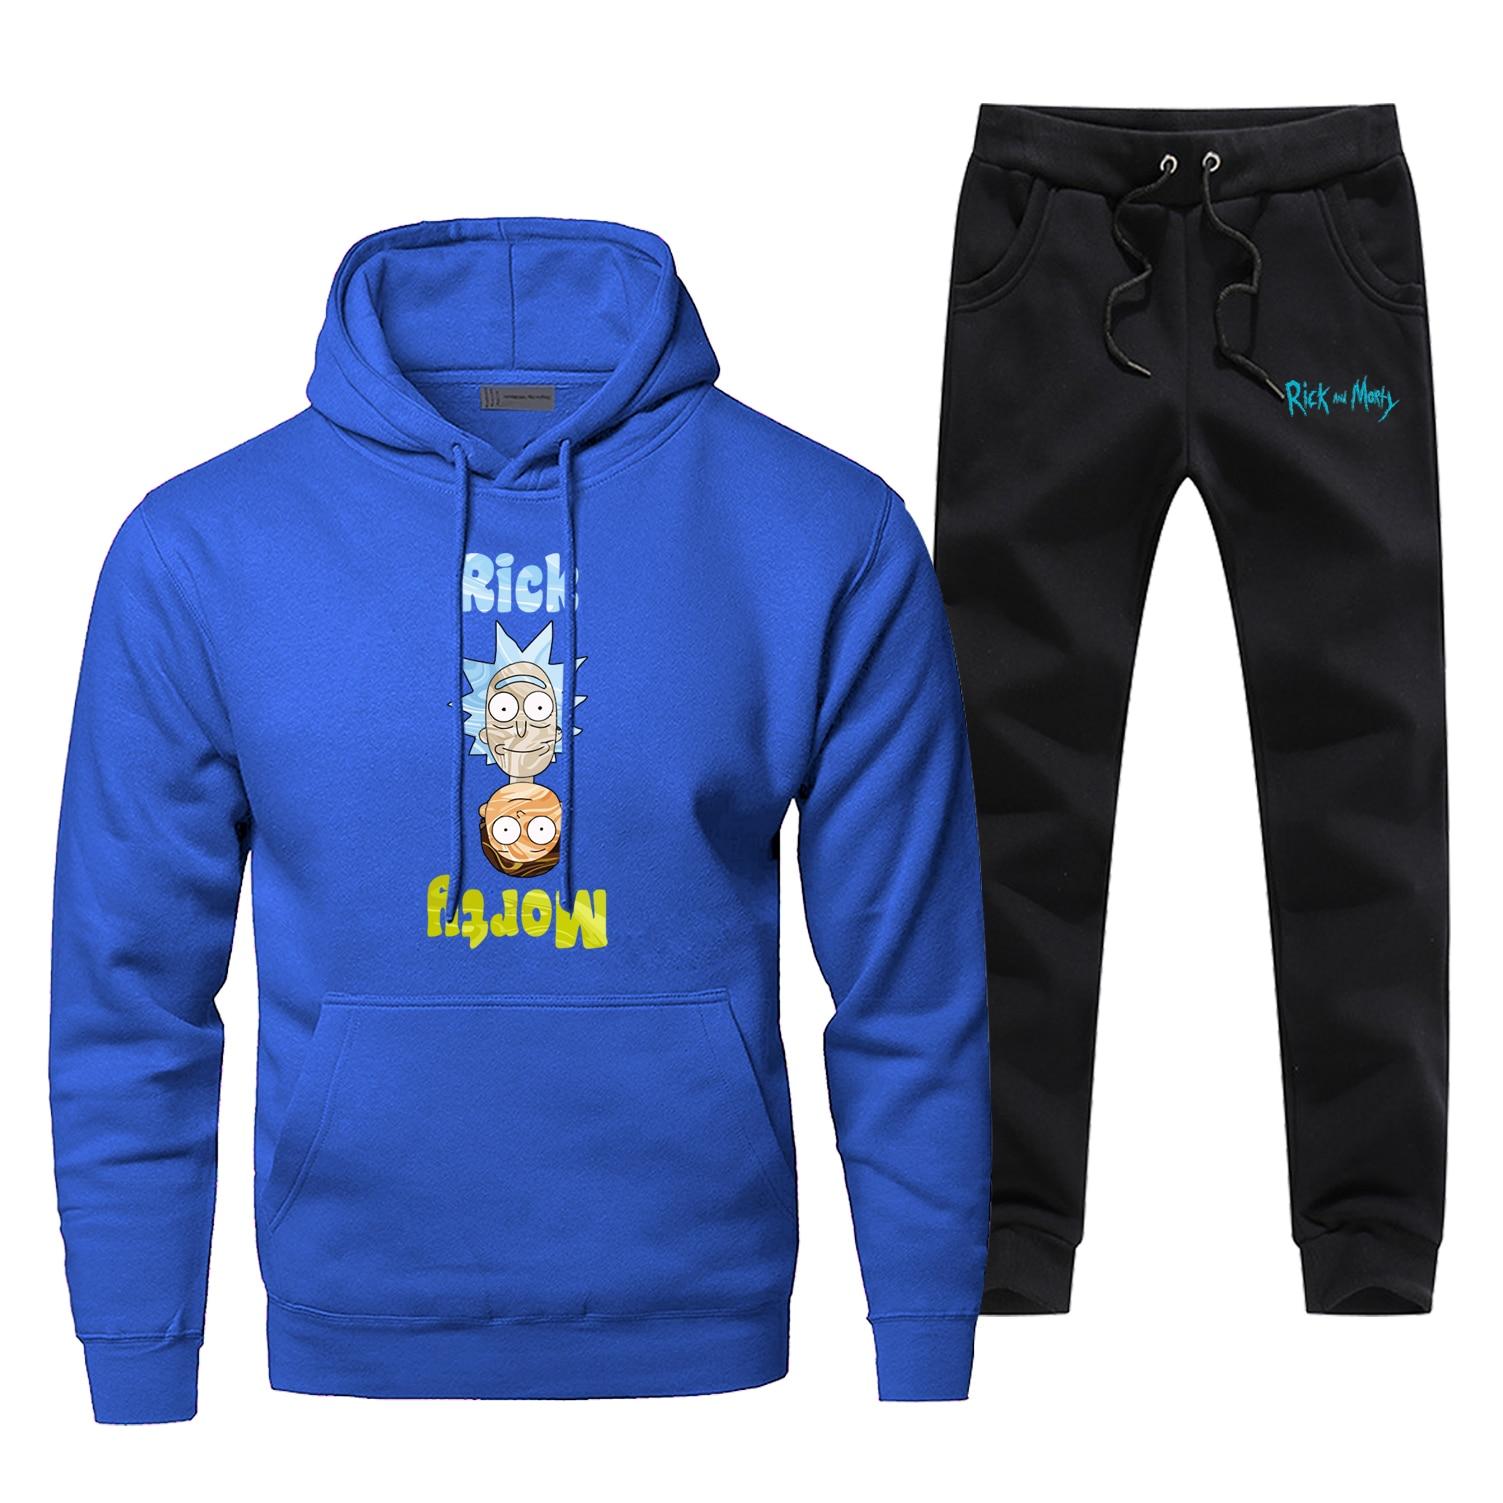 Rick And Morty Hoodies Fashion Casaul Rick Pants Sweatshirts Morty Fitness Men's Jogging Winter Bodywarmer Hip Hop Male Sets